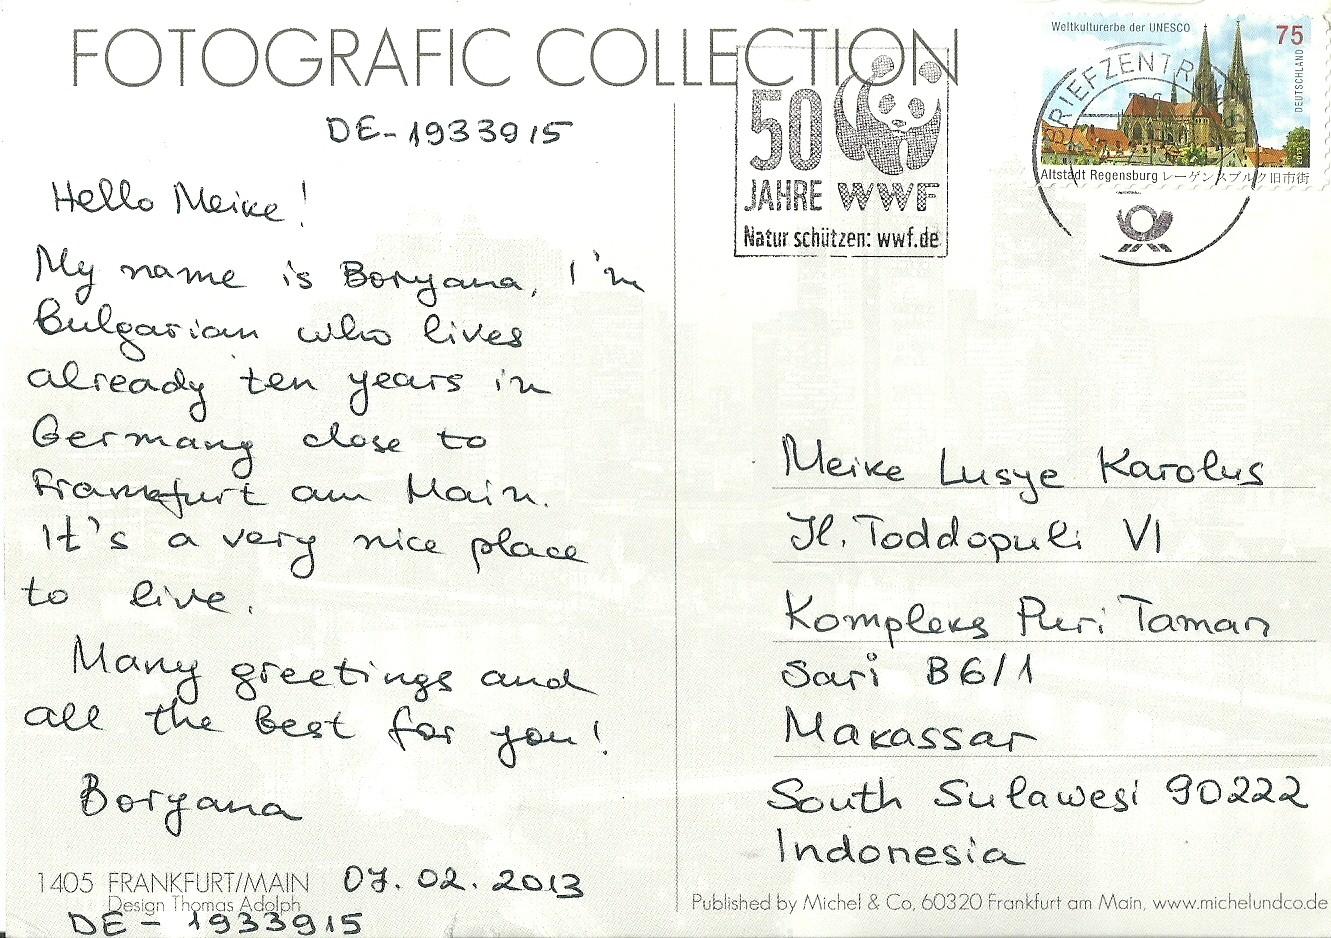 Contoh Postcard Dalam Bahasa Inggris Aneka Macam Contoh